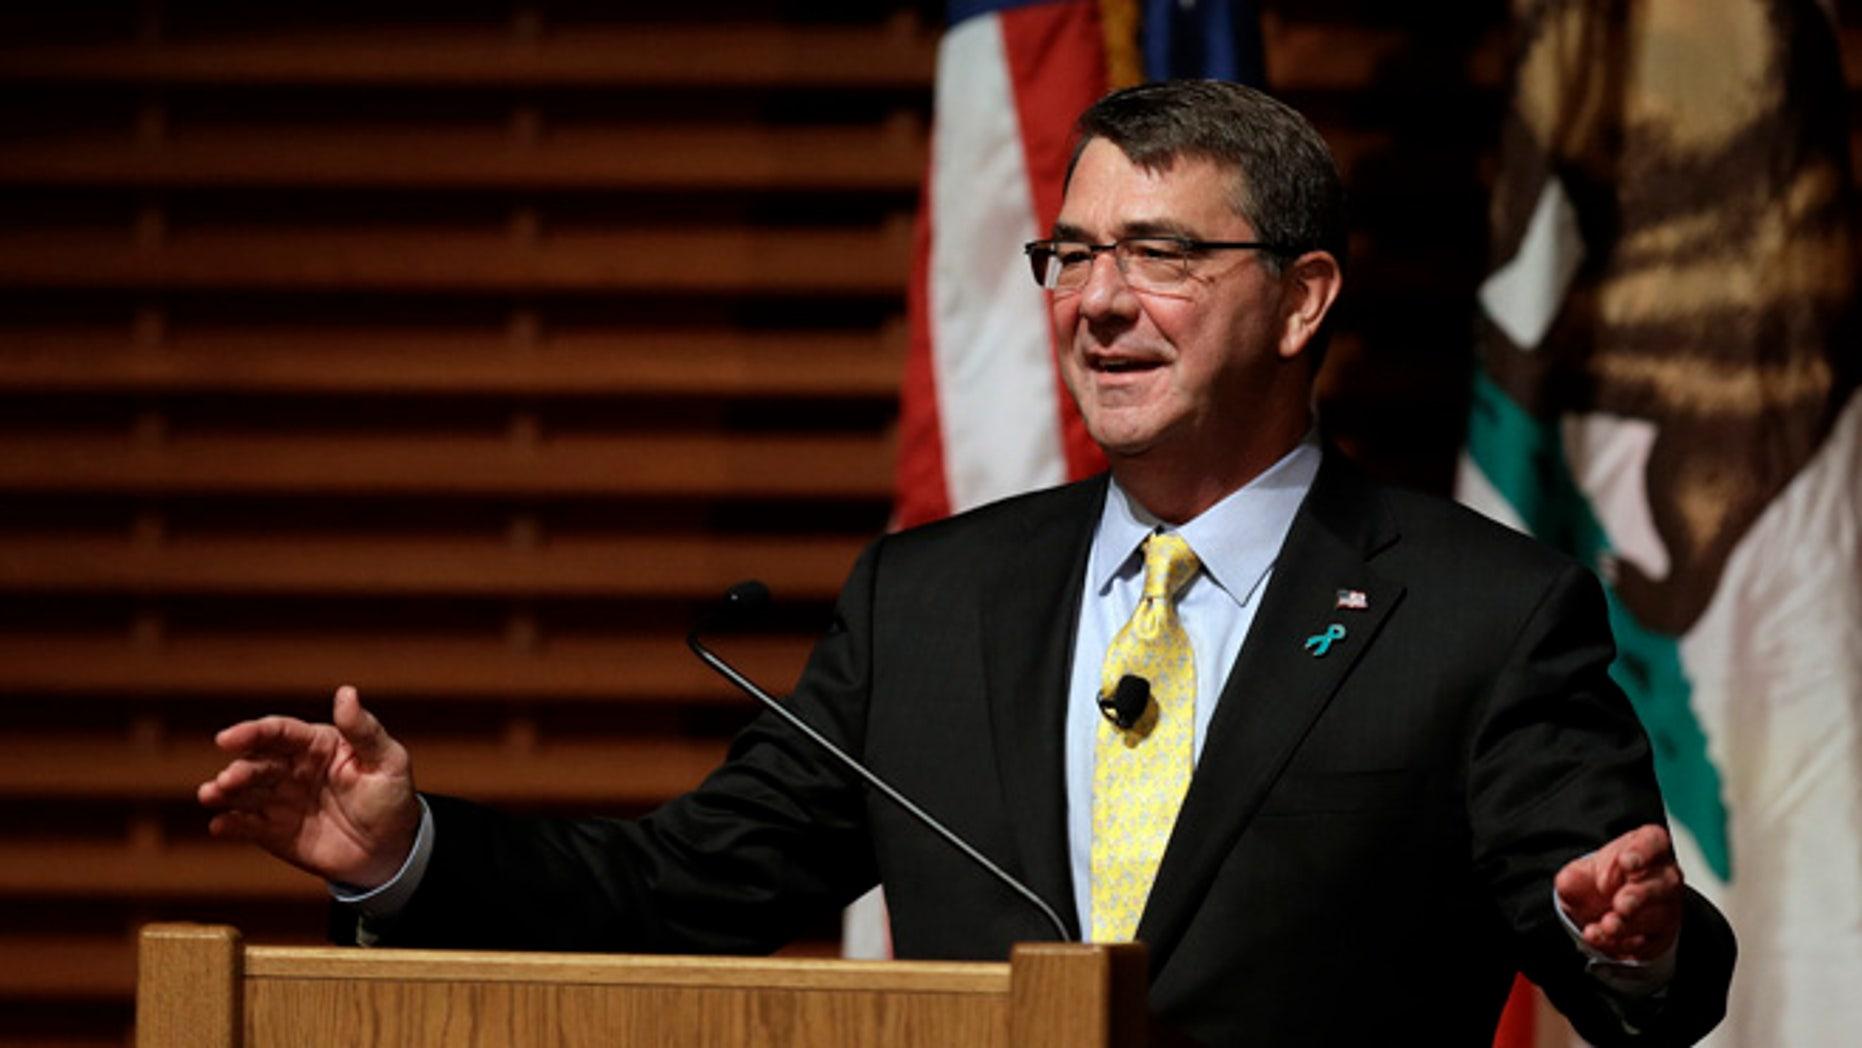 April 23, 2015: Defense Secretary Ash Carter gestures during a speech in Stanford, Calif.